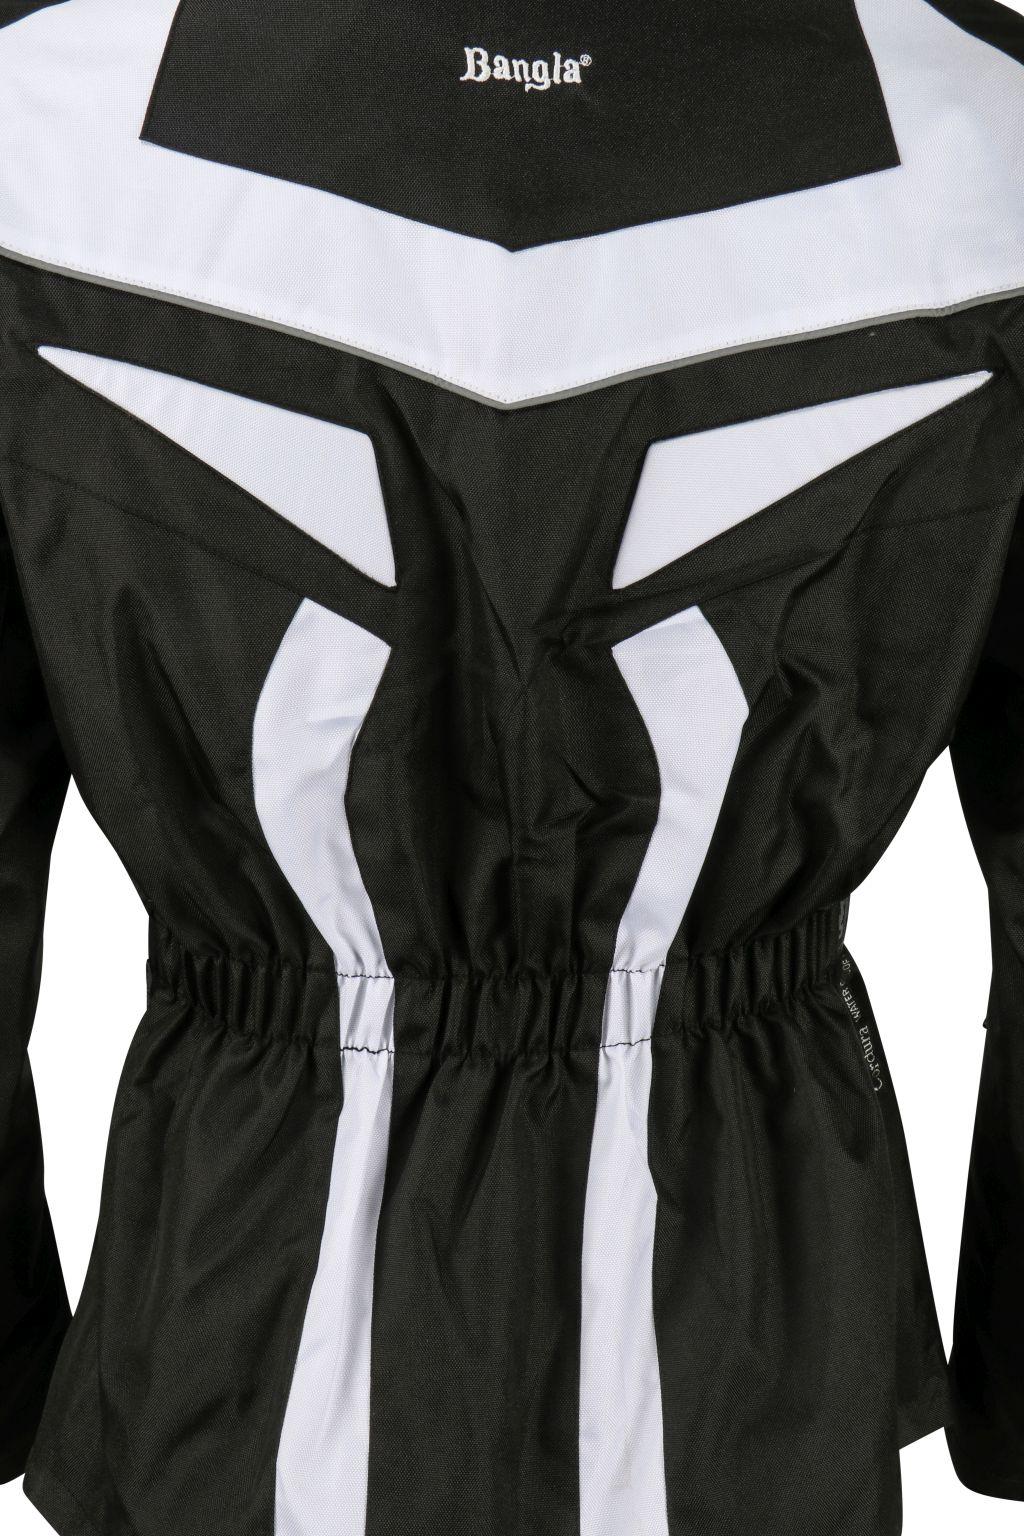 Bangla Motorrad Textil Jacke Cordura schwarz weiss S - 6 XL